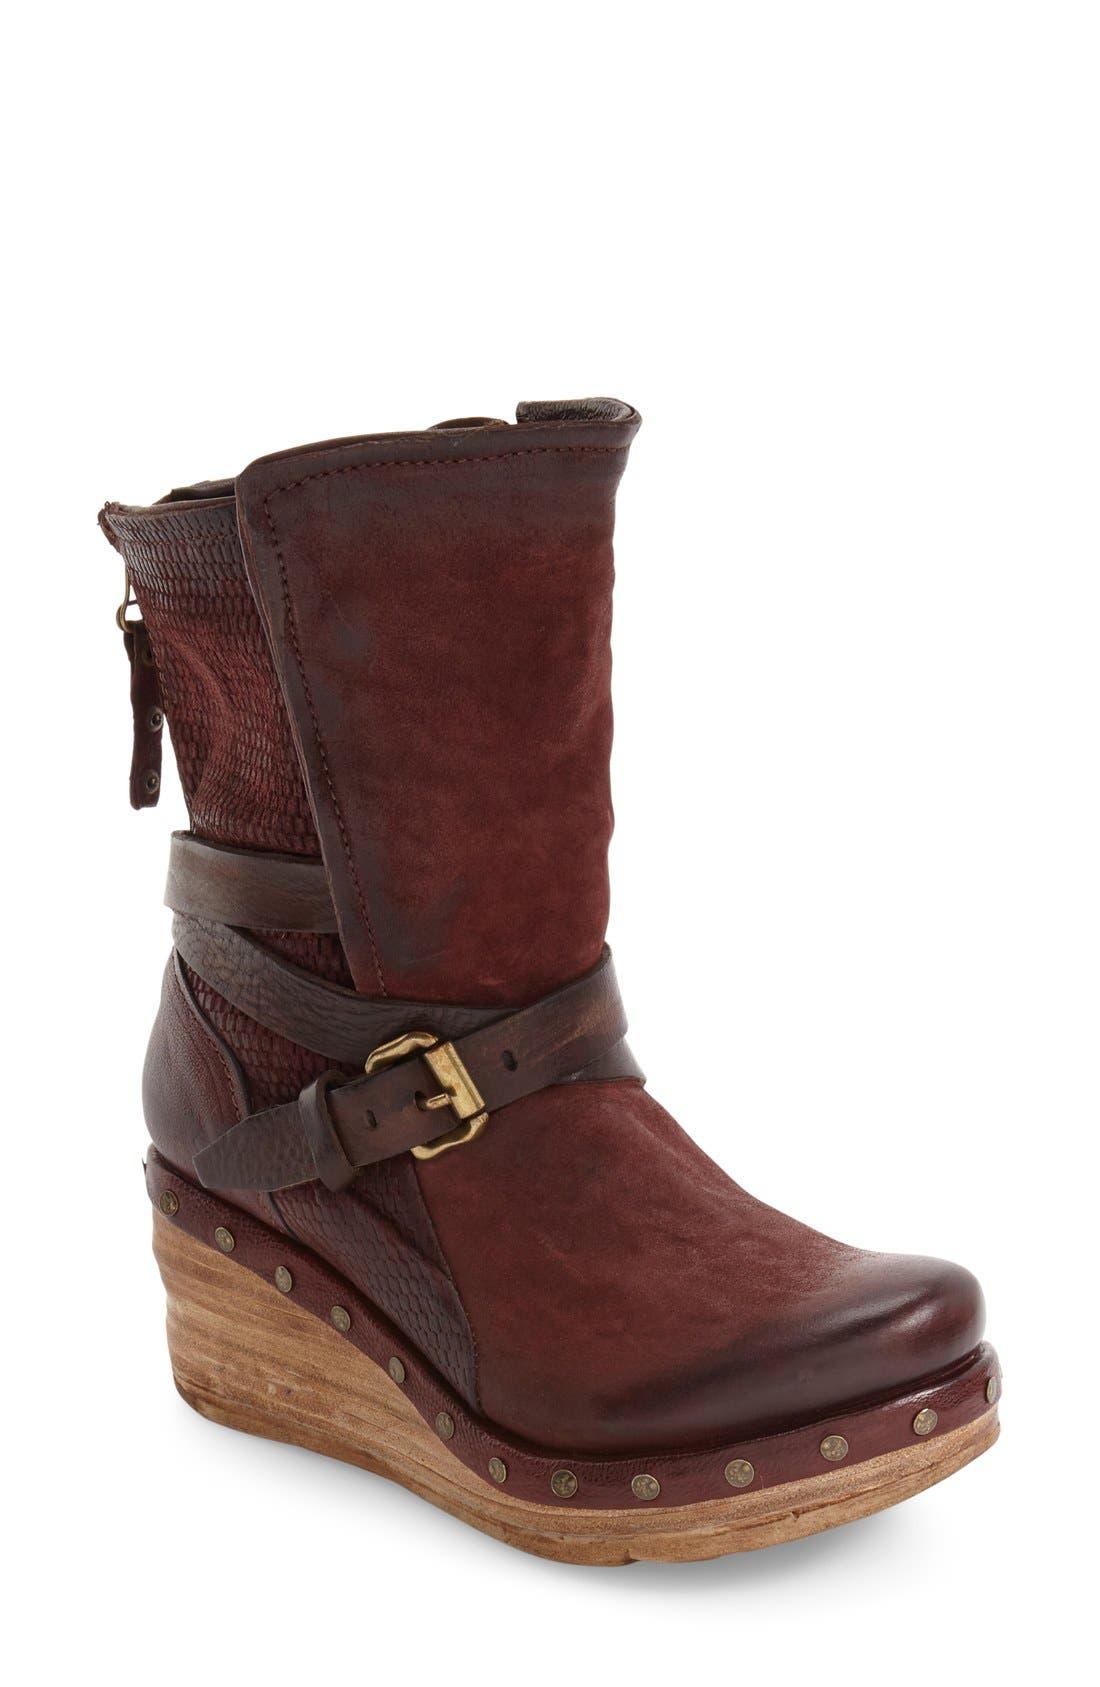 Main Image - A.S.98 Stamford Platform Wedge Boot (Women)